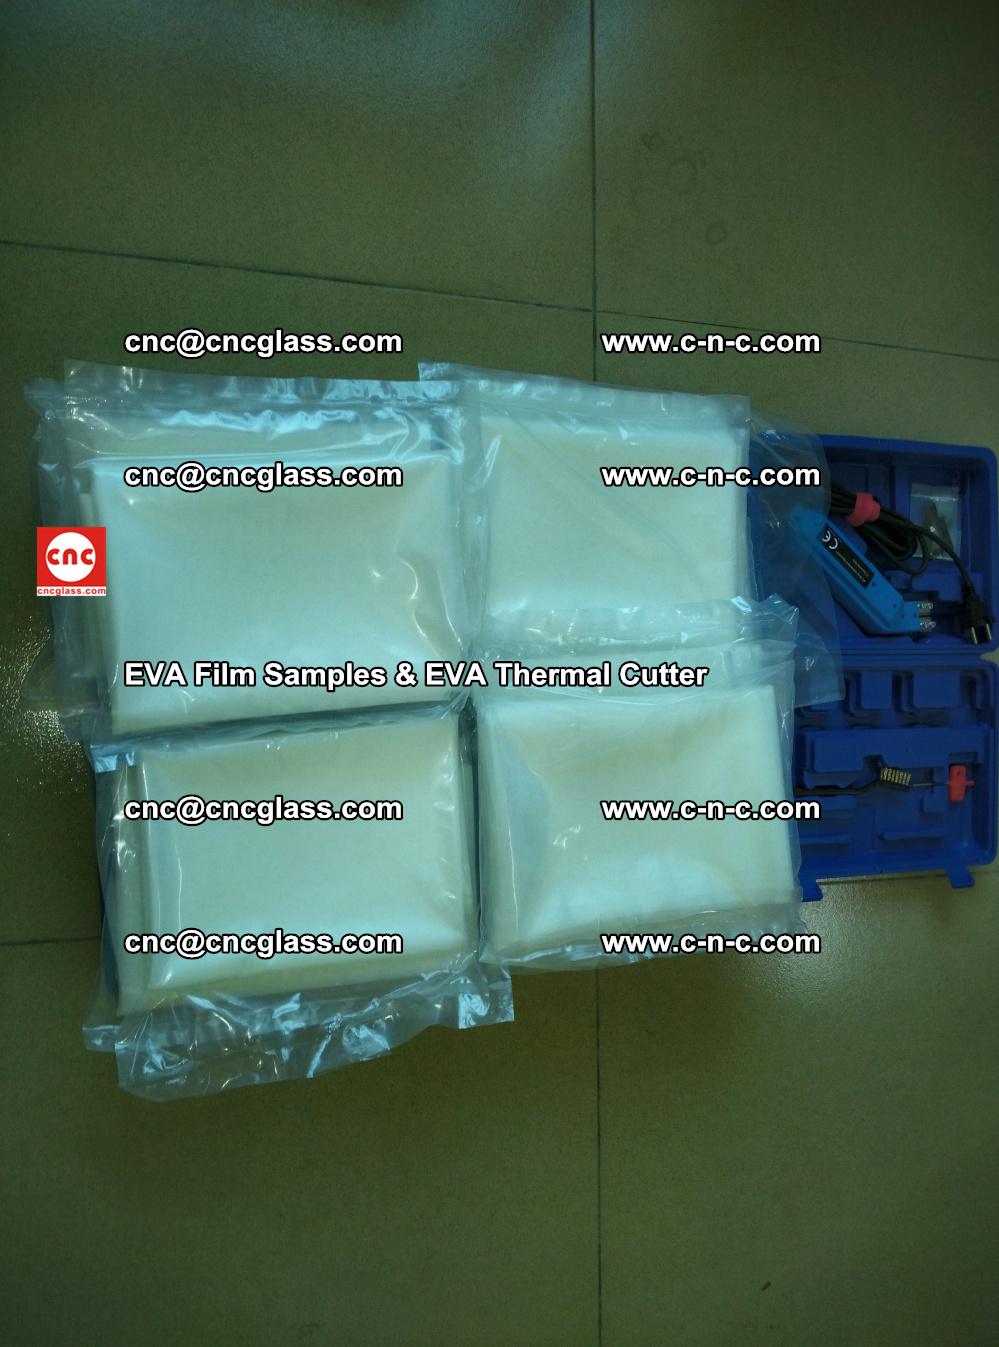 EVAFORCE SUPER CLEAR EVA Film Samples and EVA Thermal Cutter (43)